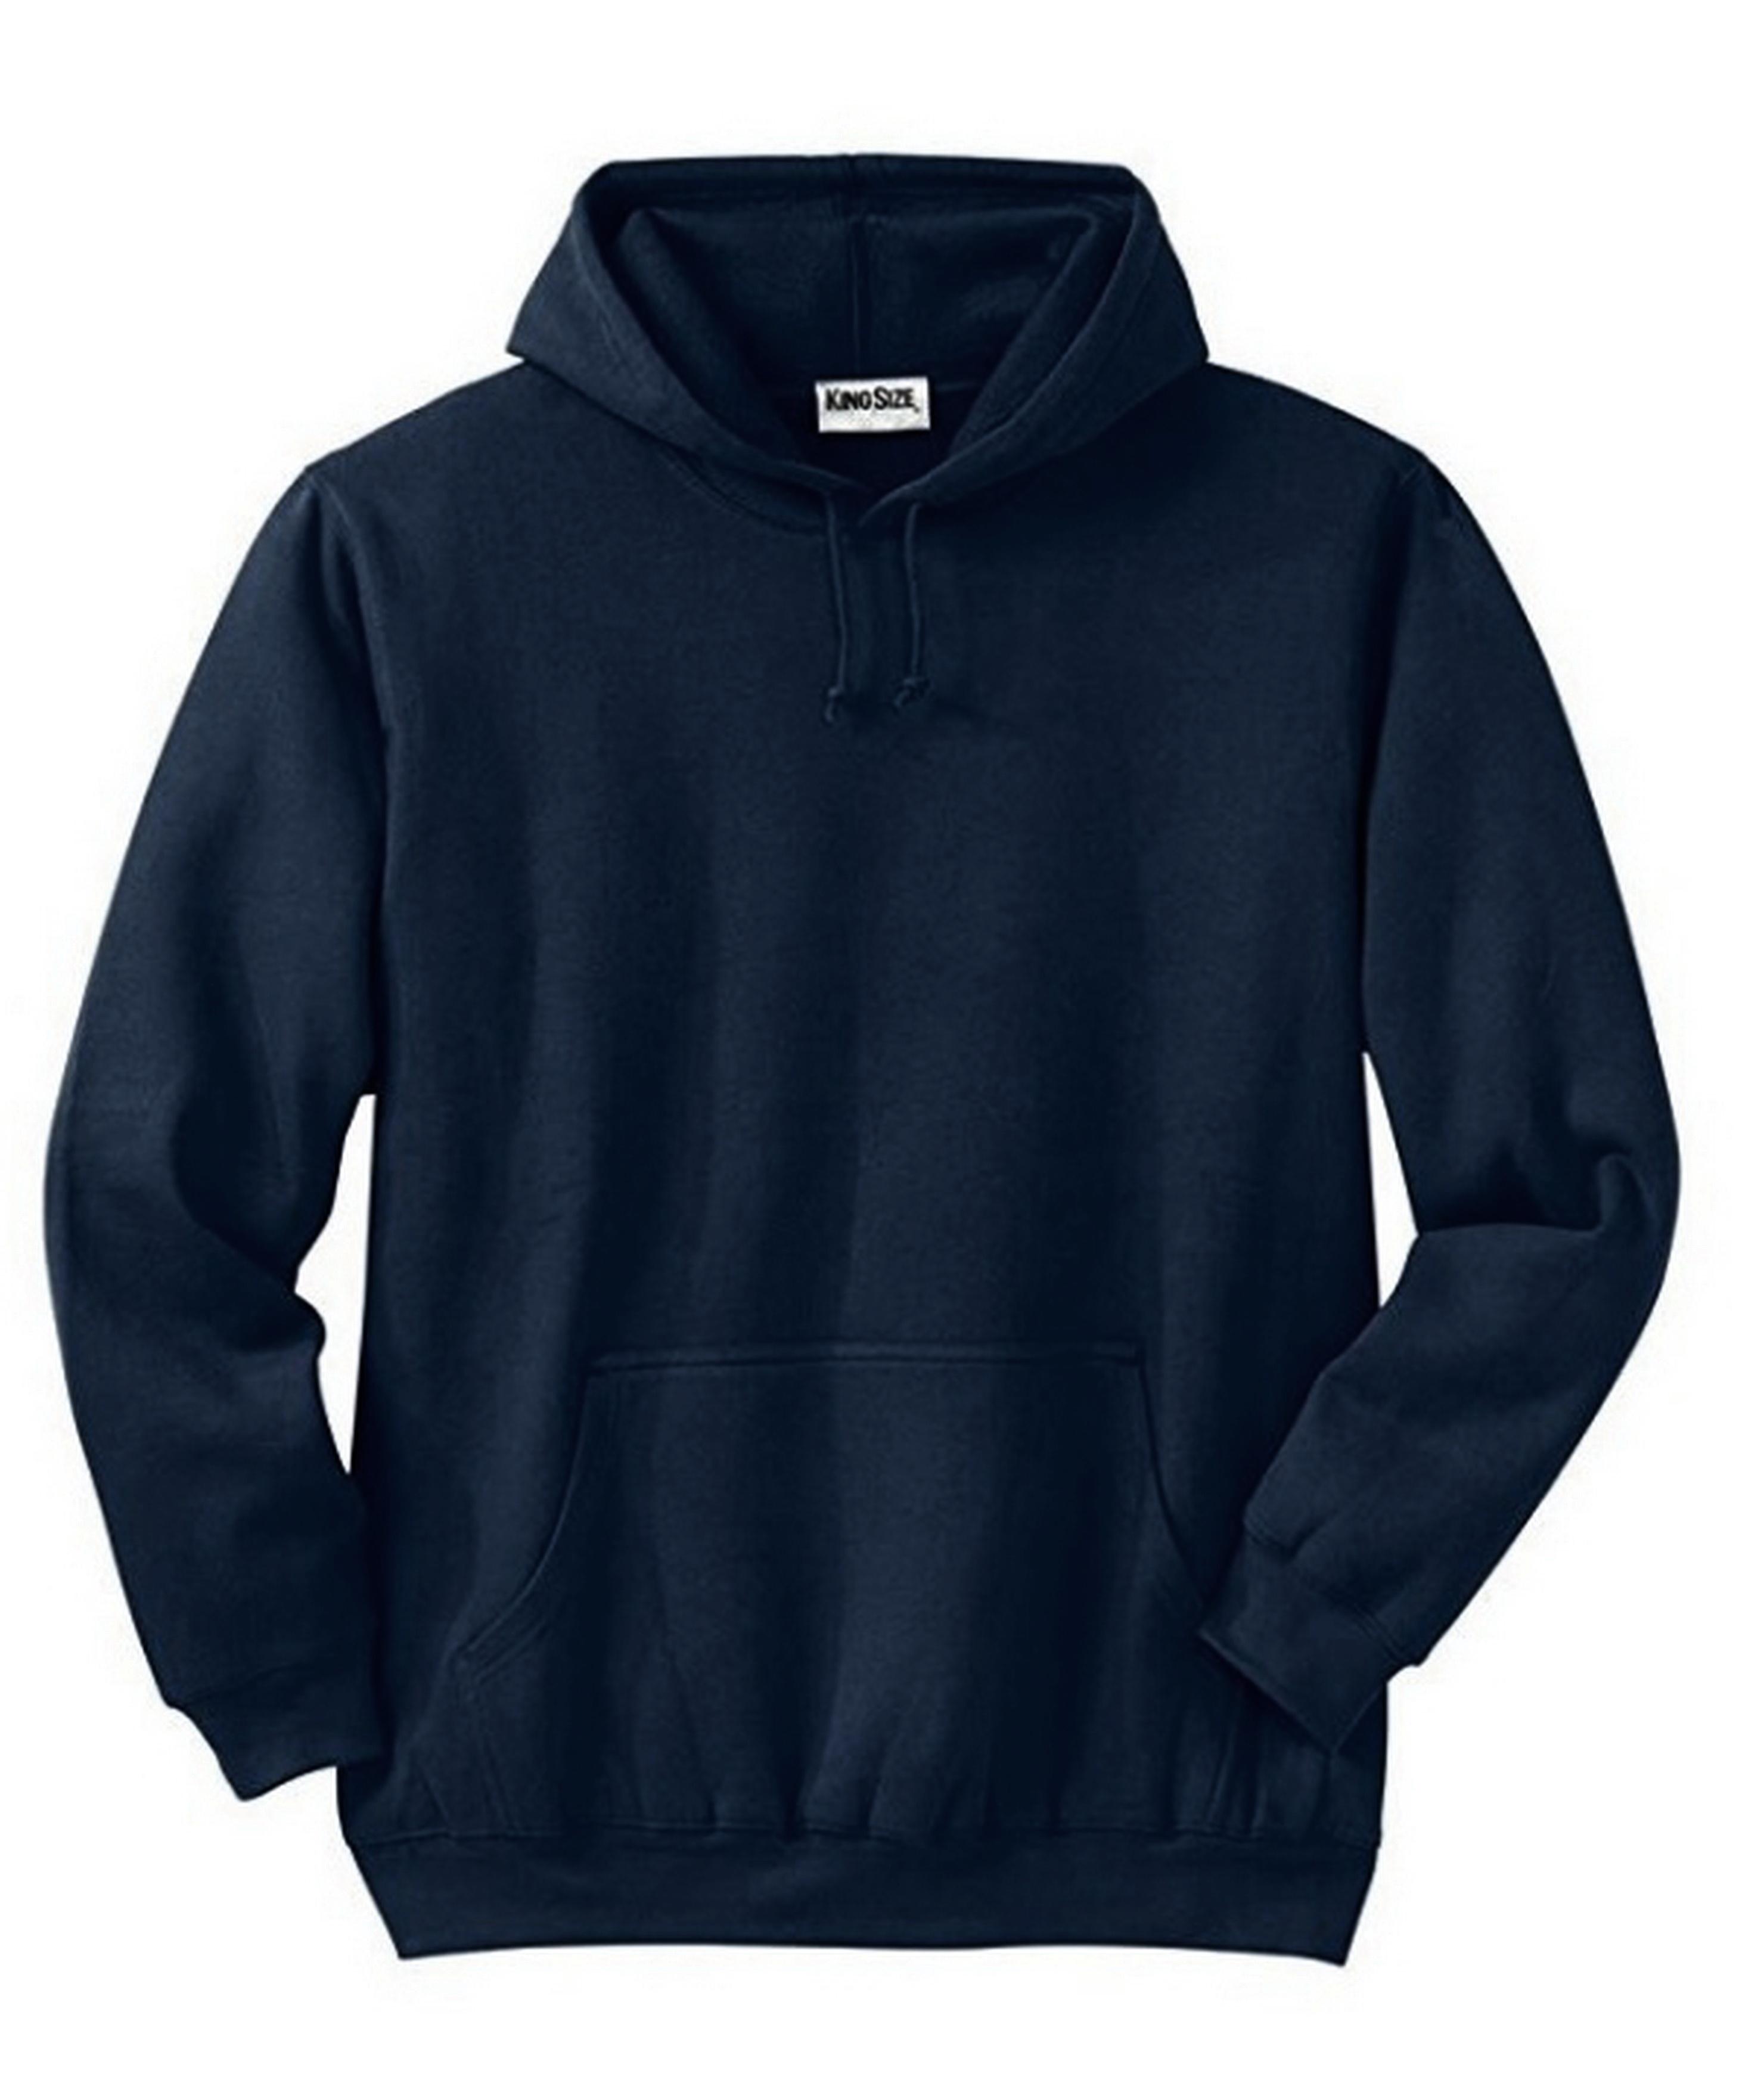 KS SPORT KINGSIZE Mens Fleece Pullover Hoodie Big /& Tall Size 280763RM